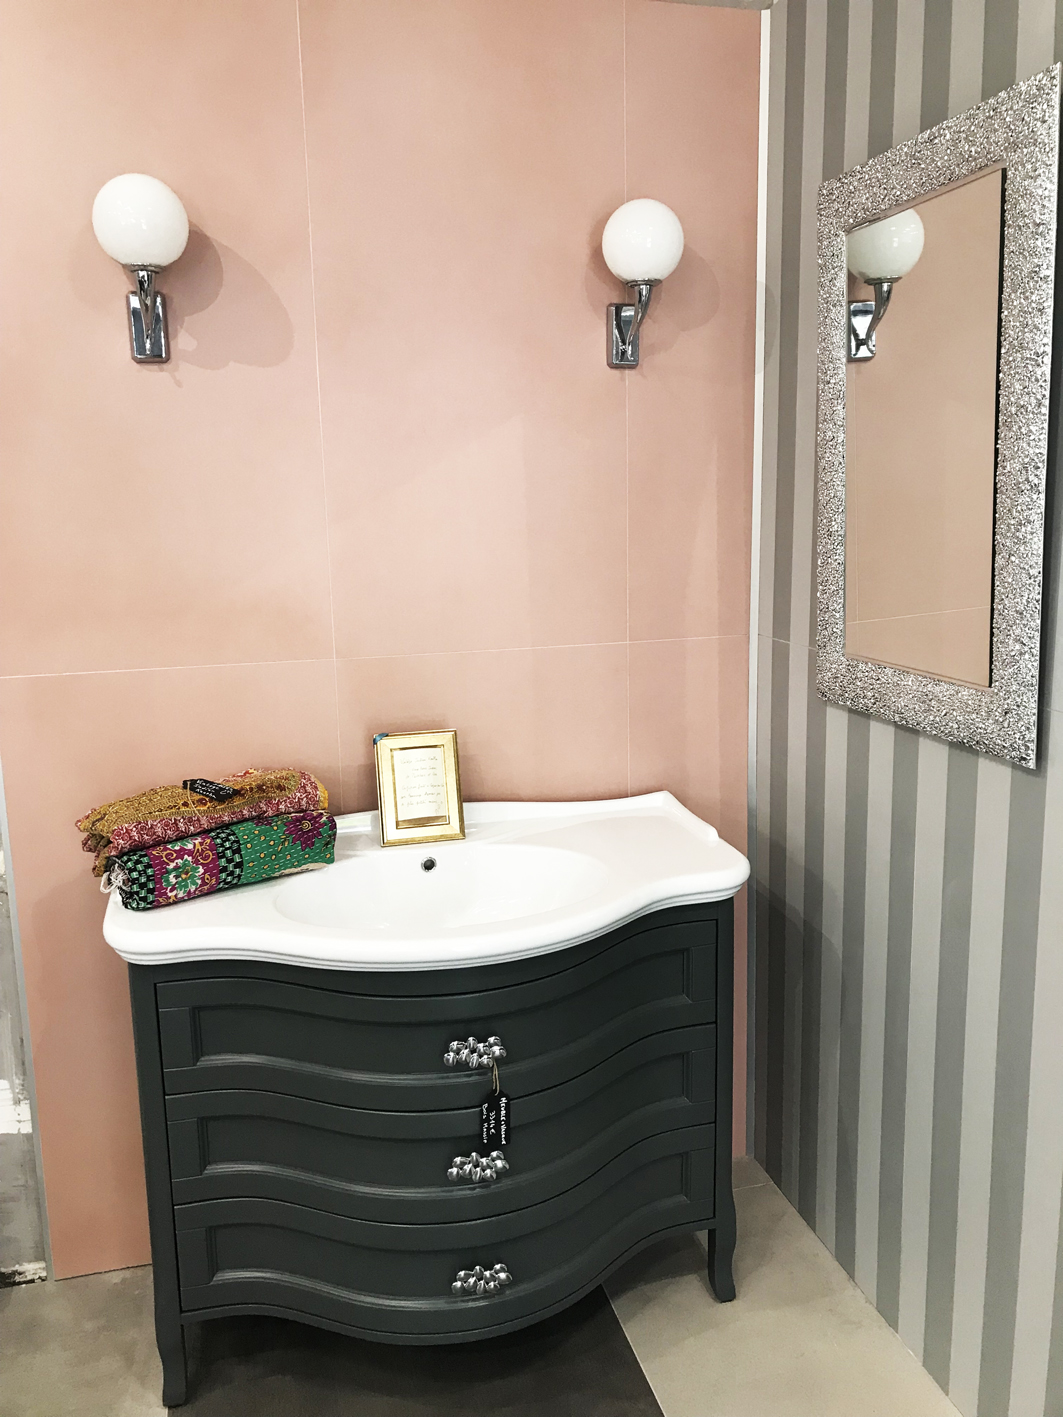 Salle De Bain Antibes meubles de salle de bain - carrelage antibes